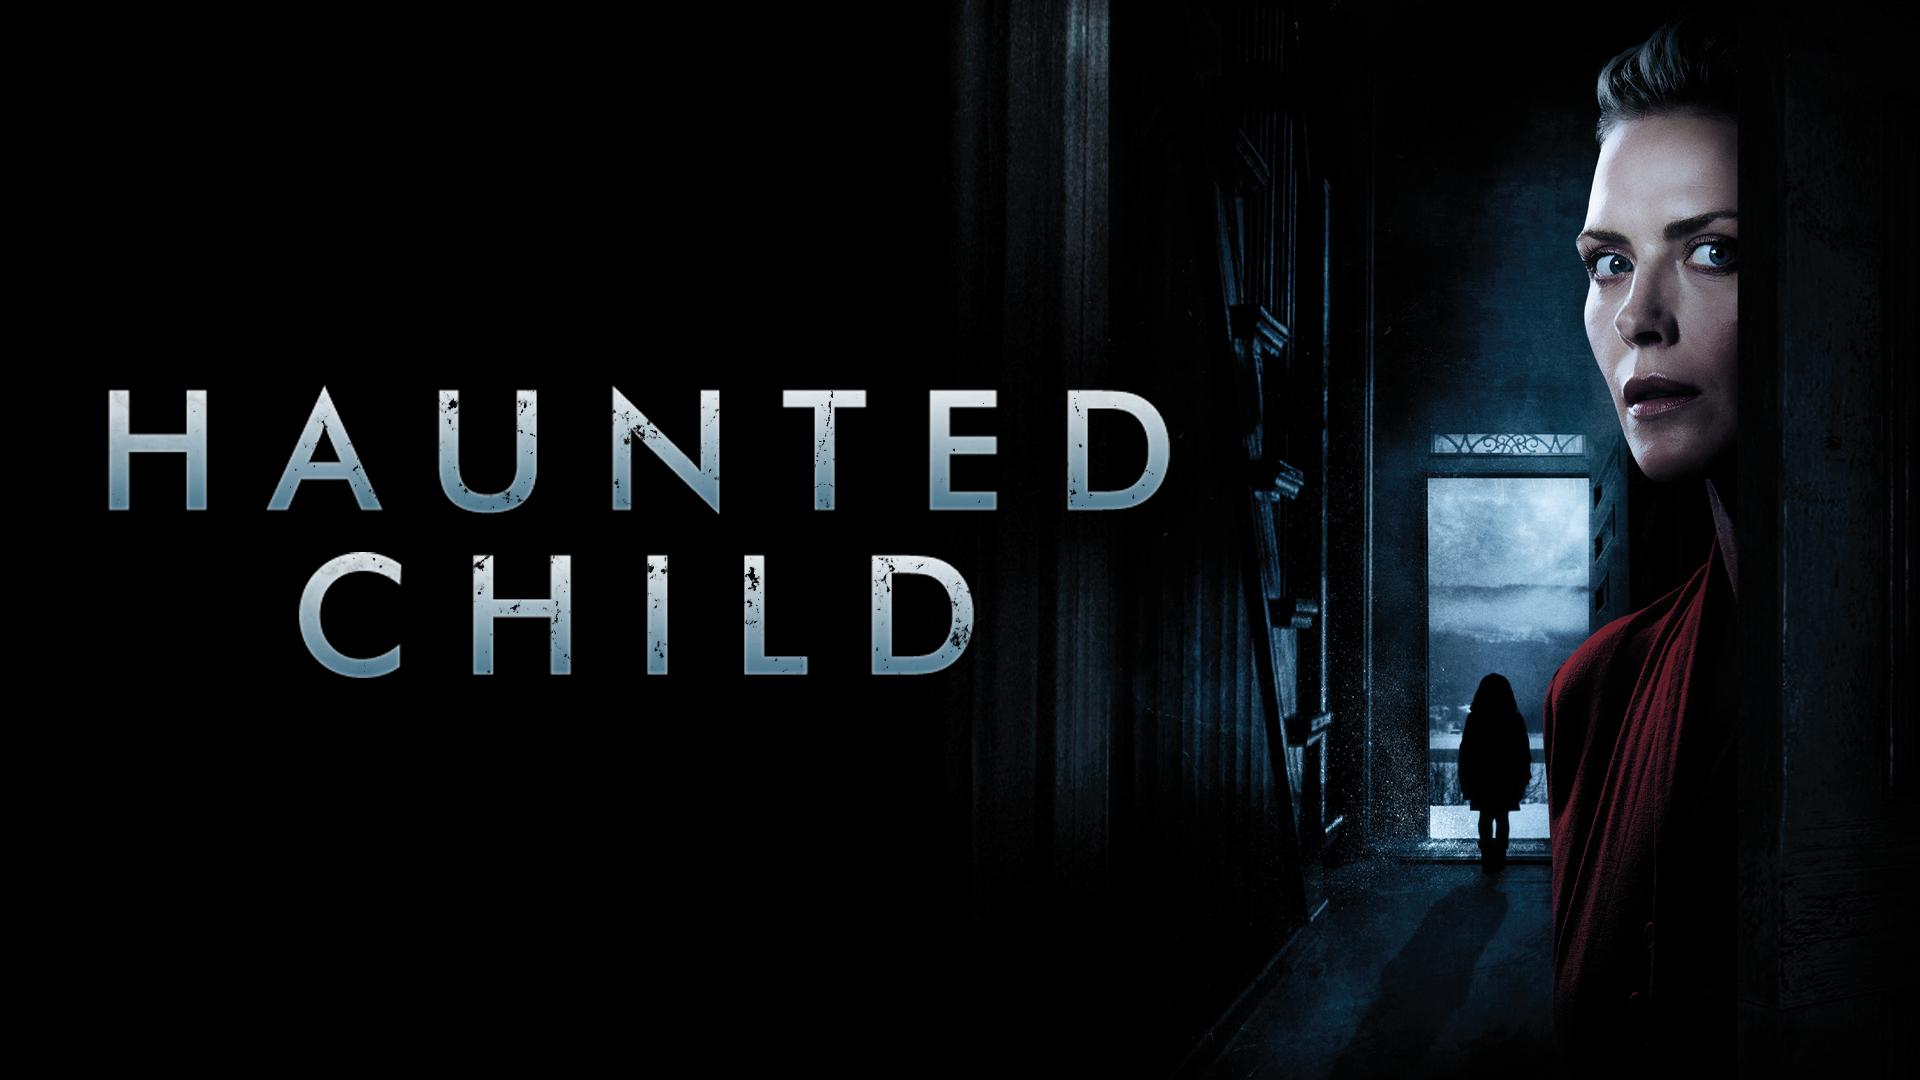 Haunted Child